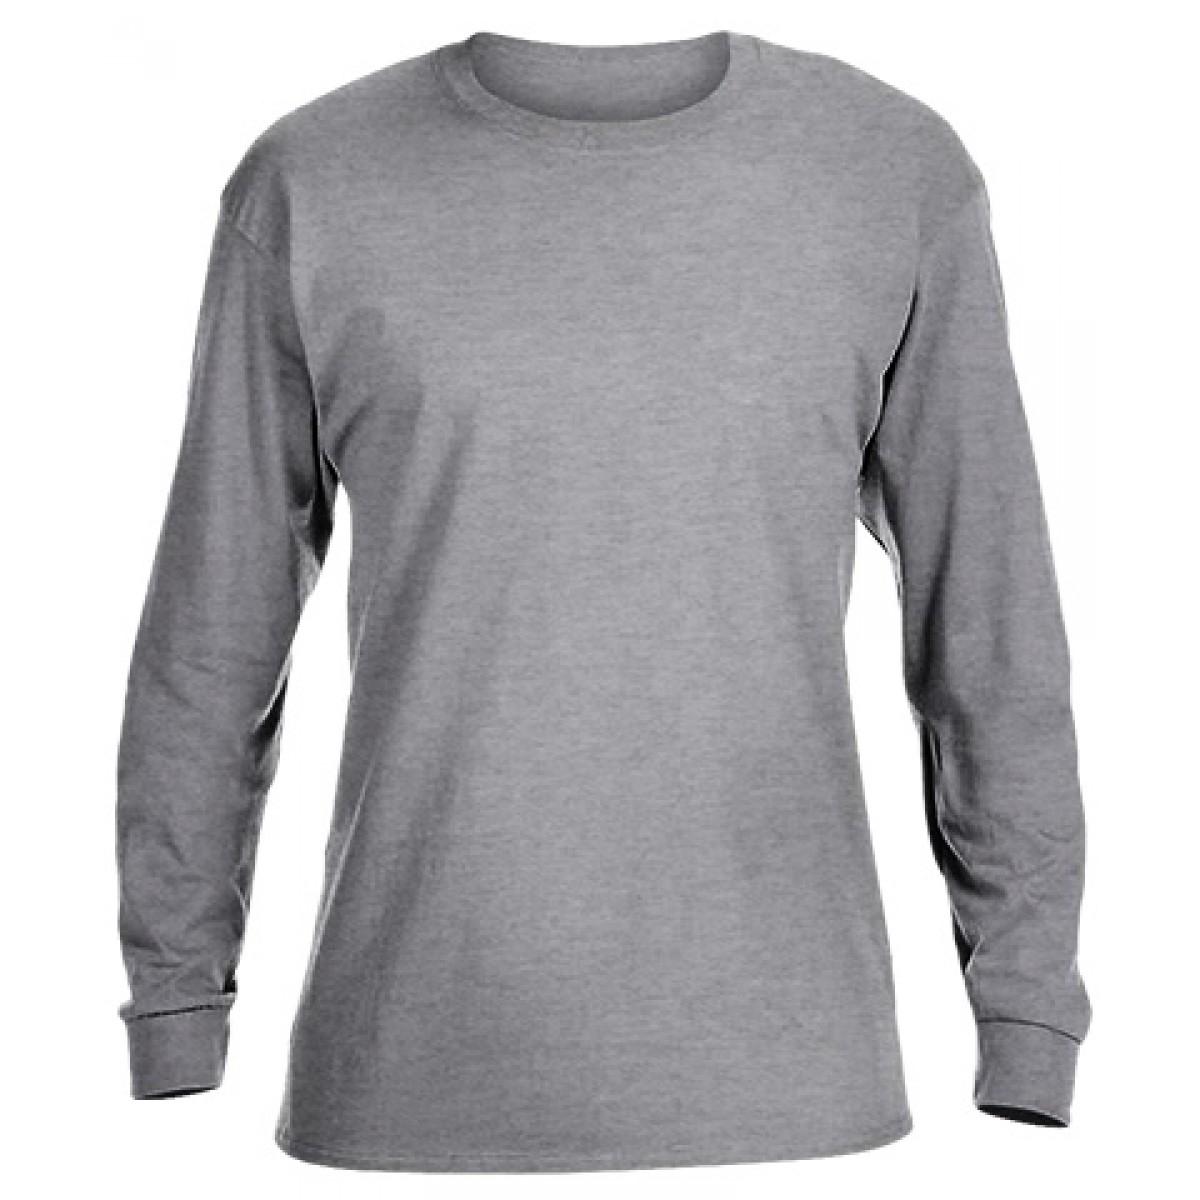 Heavy Cotton Long-Sleeve Adidas Shirt-Sports Grey-XS